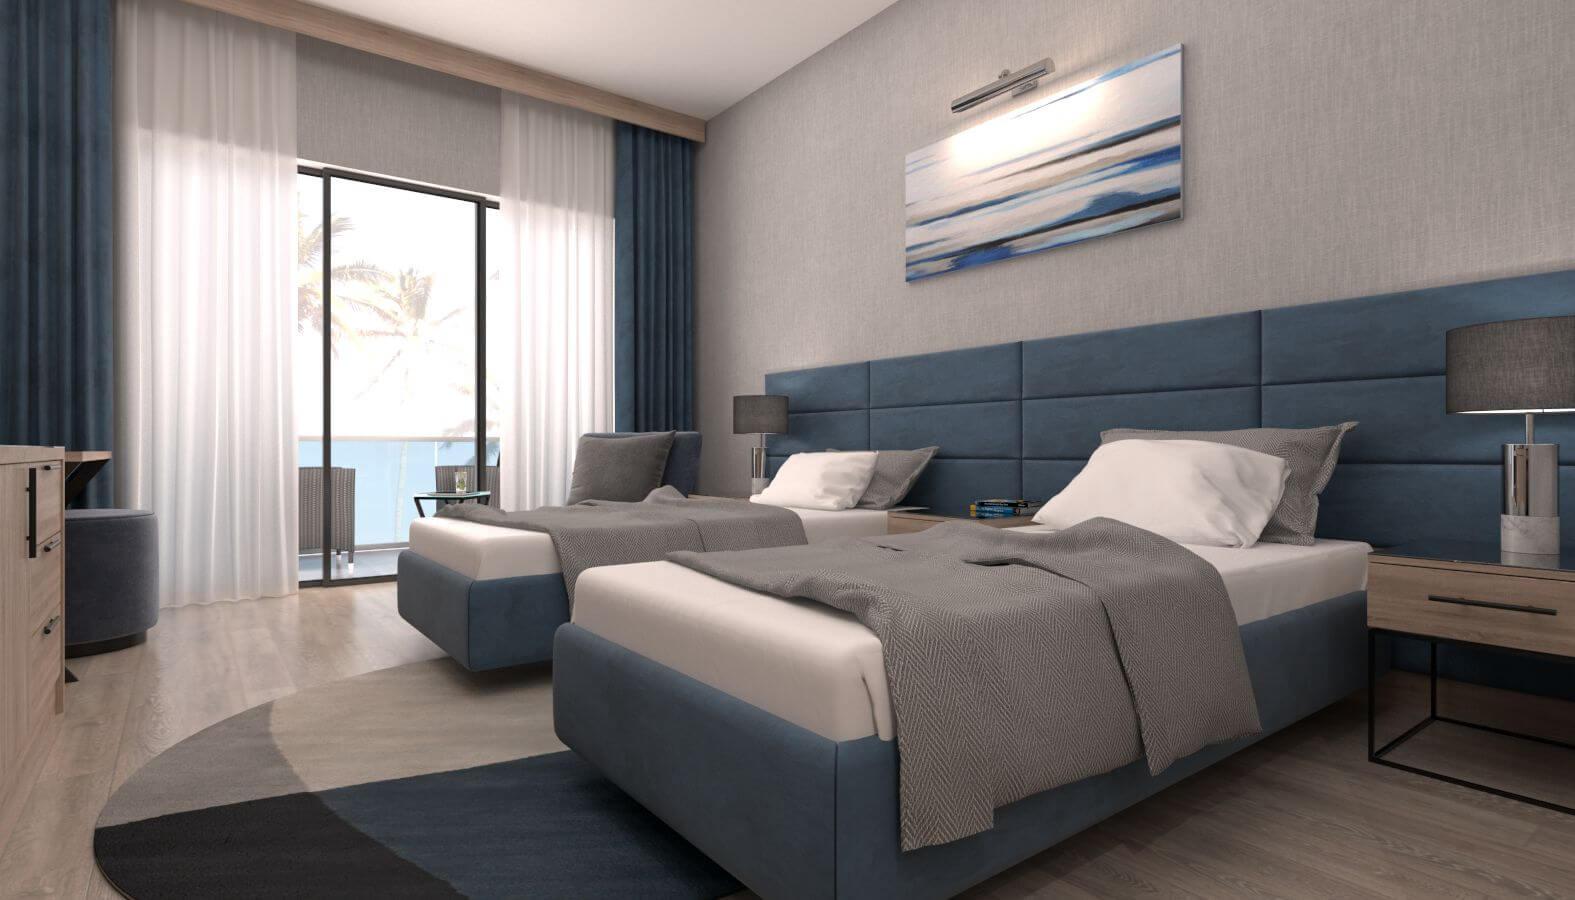 Lobby design 3609 Dogruer hotel Hotels